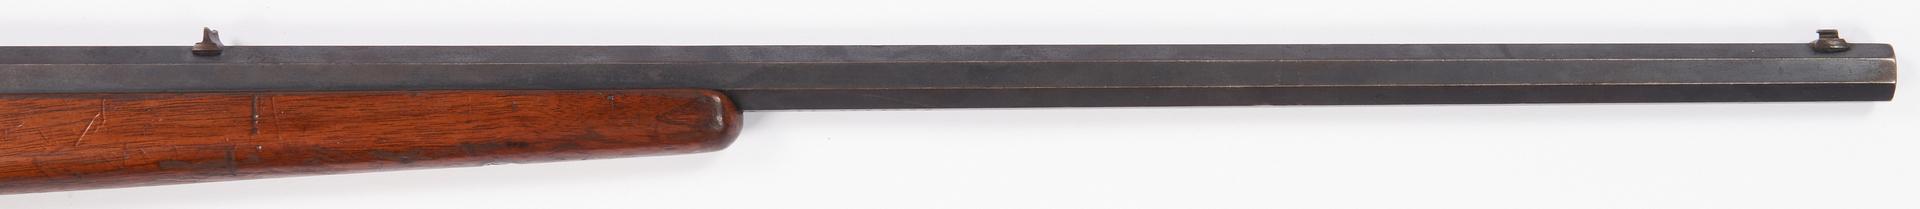 Lot 622: Remington New Model No. 4 Takedown Rolling Block Rifle, .22 cal.